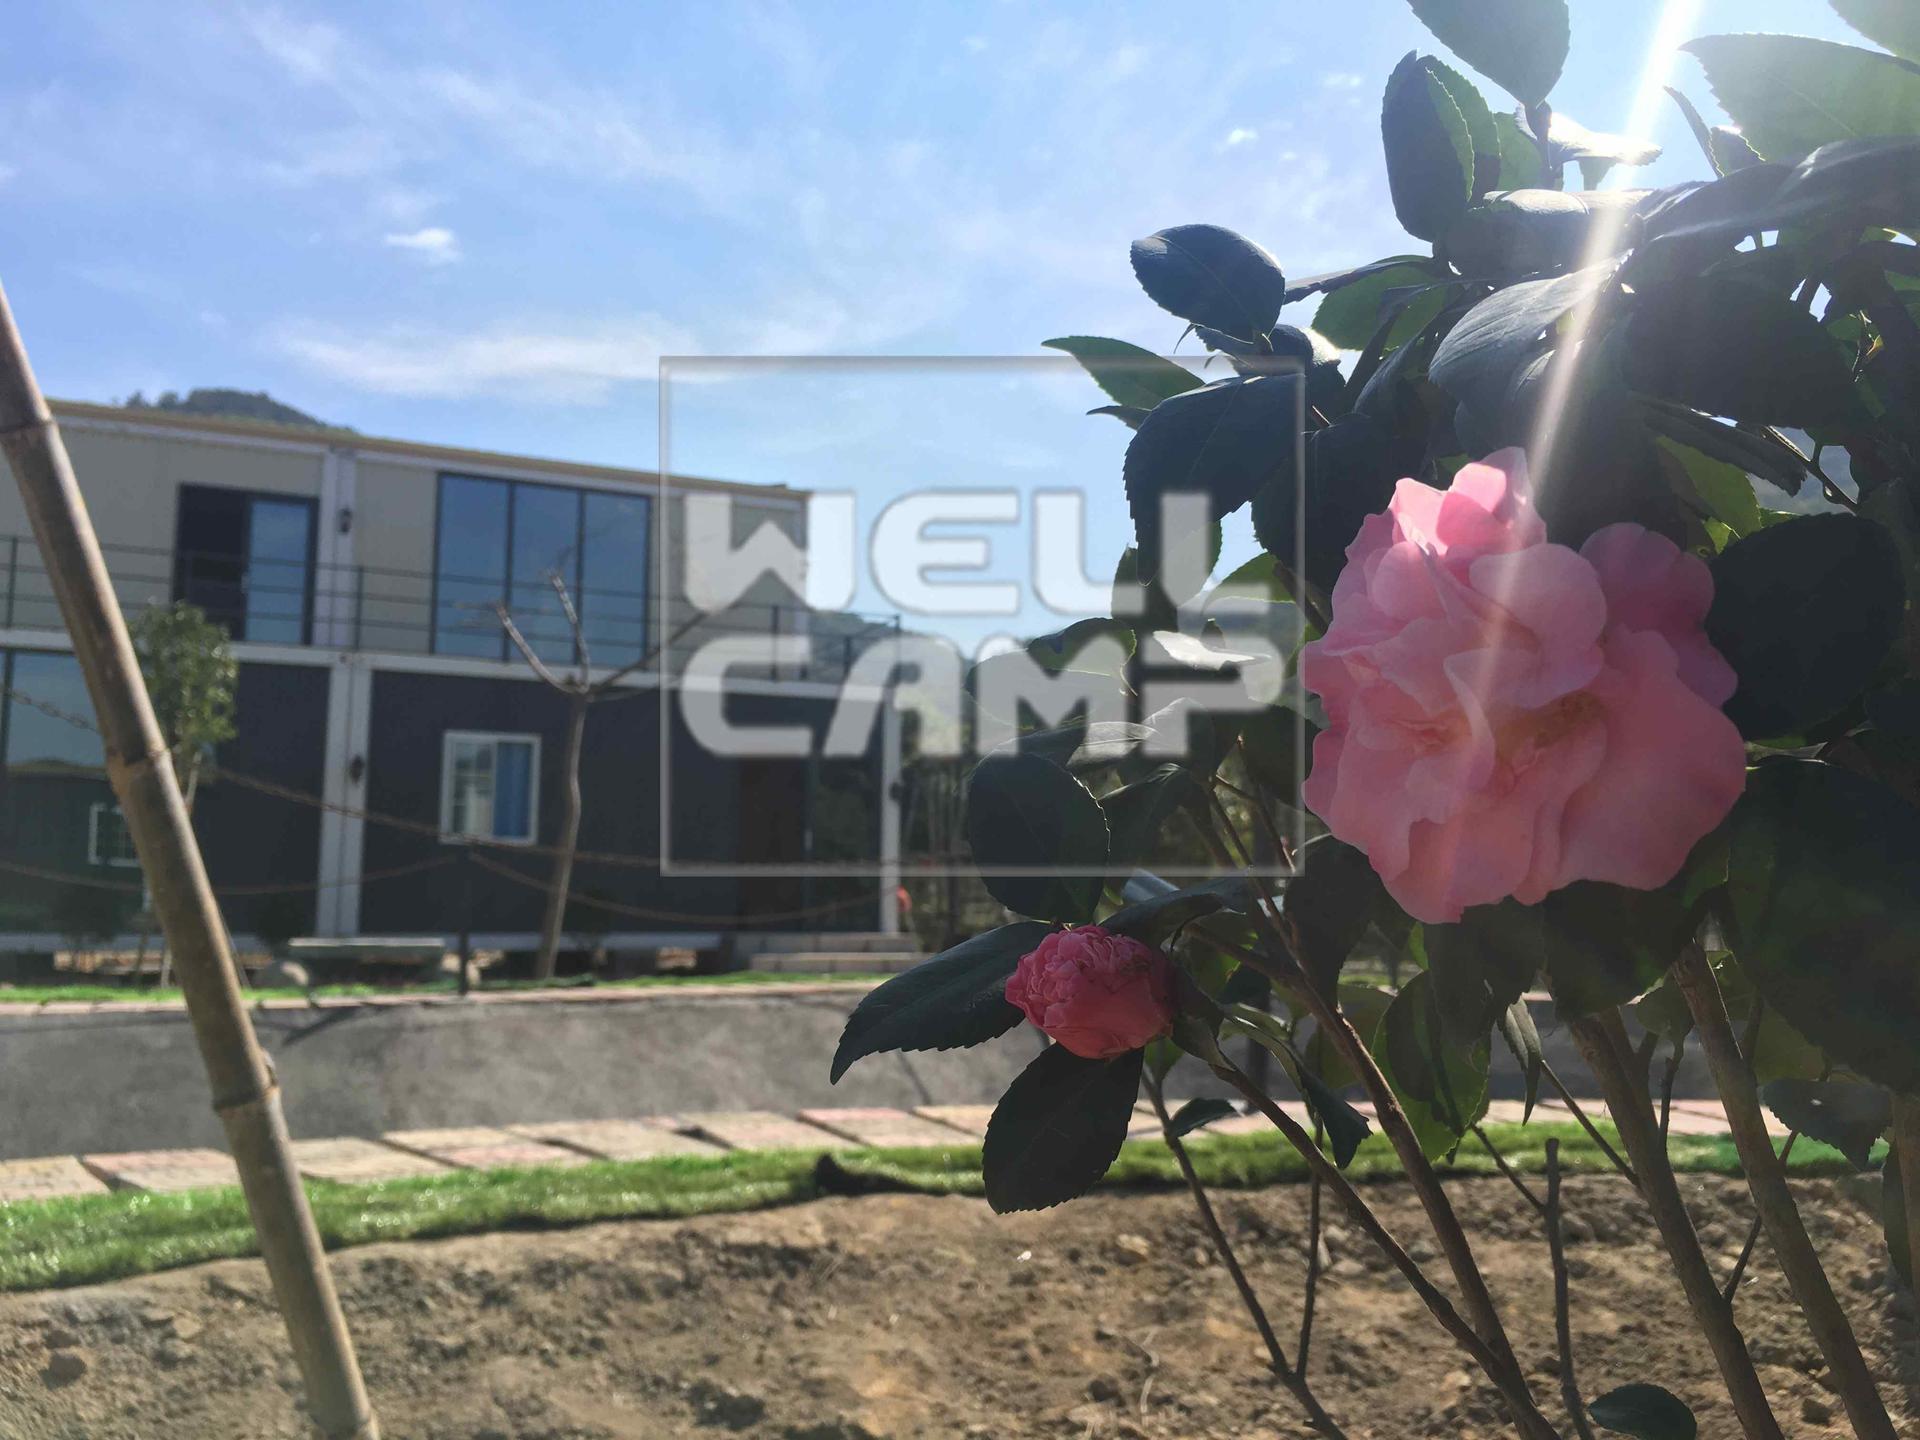 Wellcamp ripple detachable container villa for vocation village